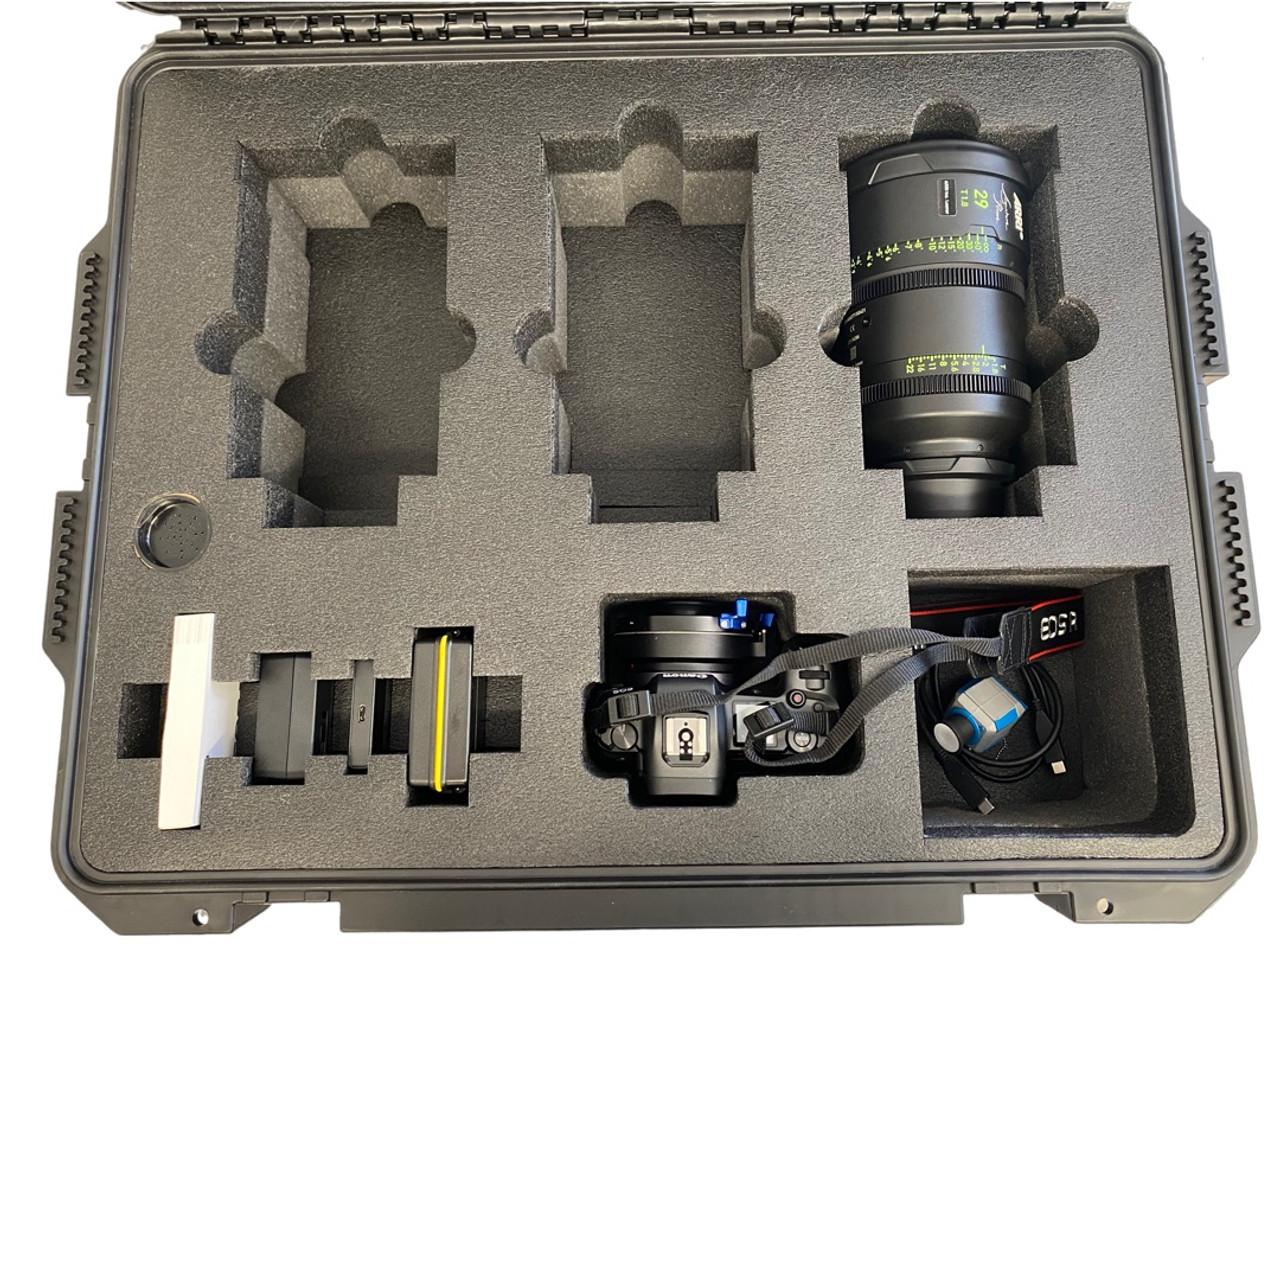 ARRI SIGNATURE PRIME and Canon EOS R Case